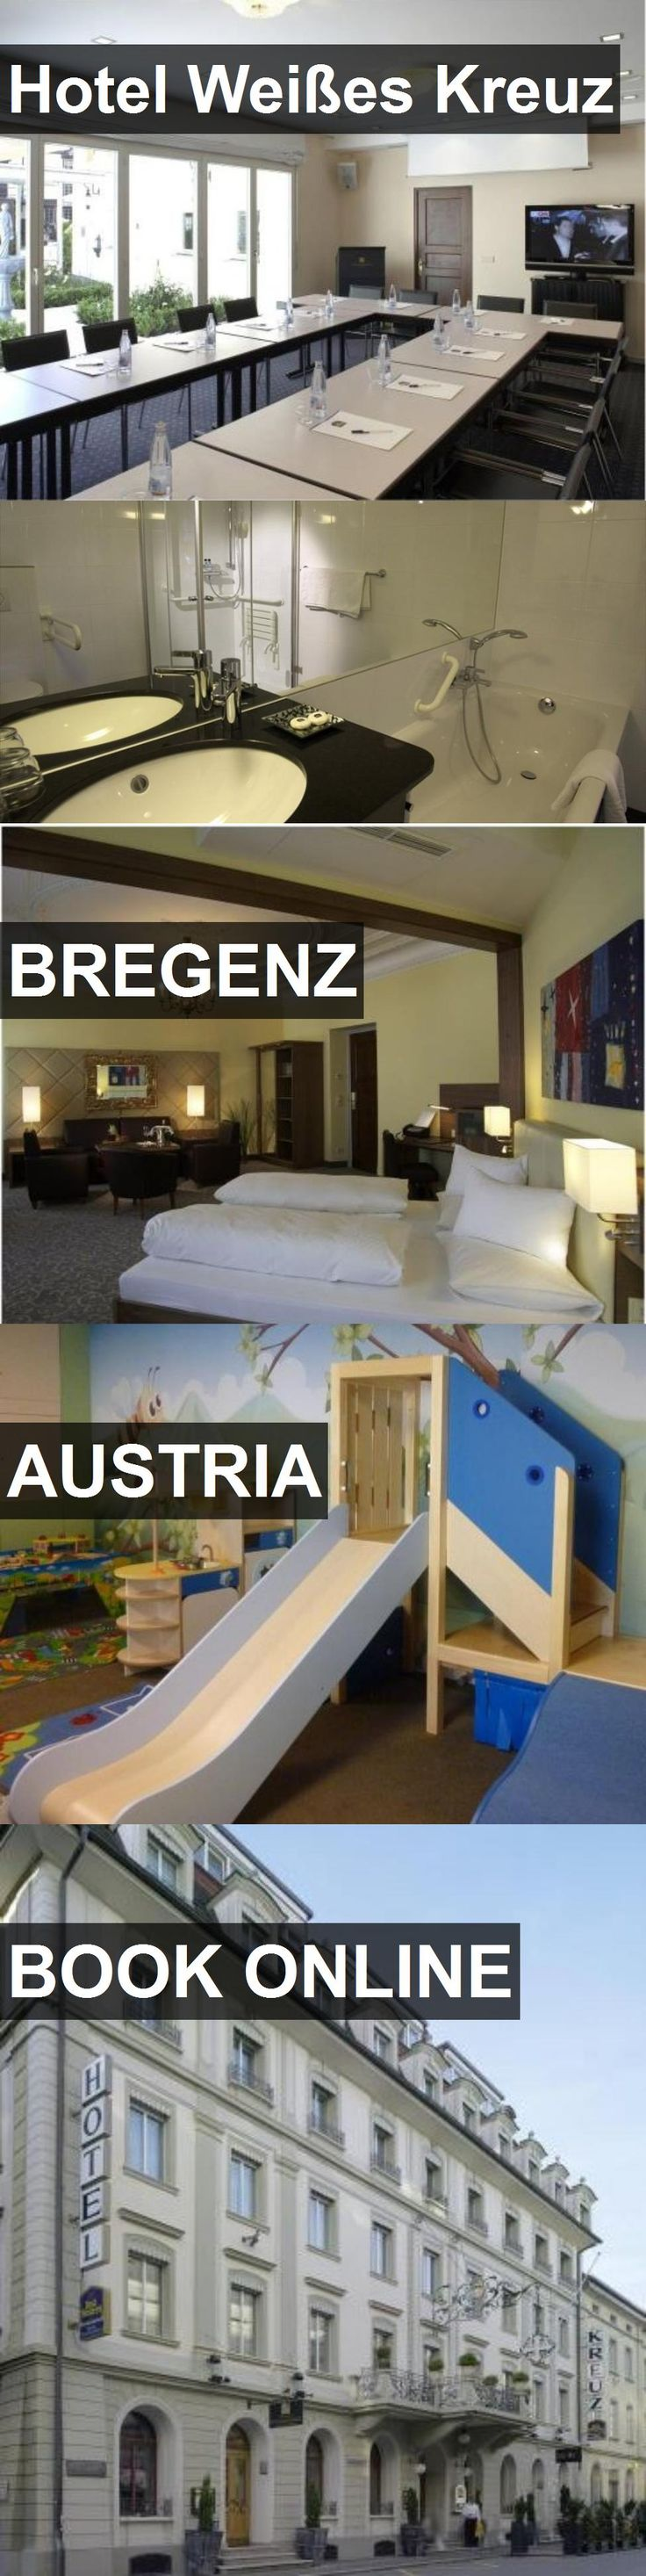 Hotel Weißes Kreuz in Bregenz, Austria. For more information, photos, reviews and best prices please follow the link. #Austria #Bregenz #travel #vacation #hotel